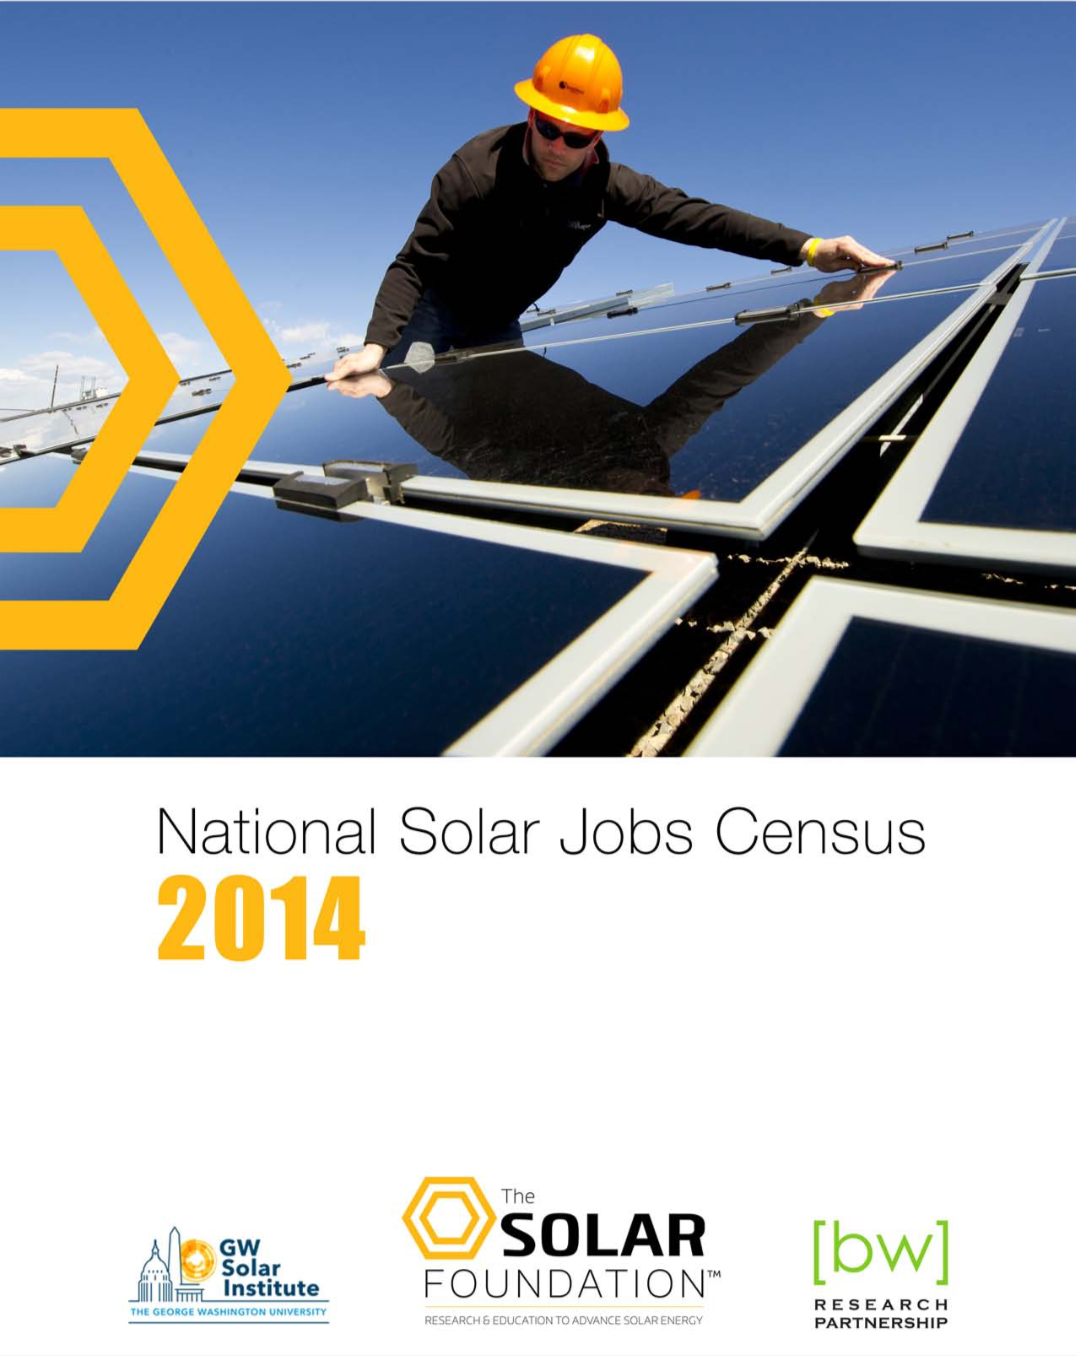 National Solar Jobs Census 2014